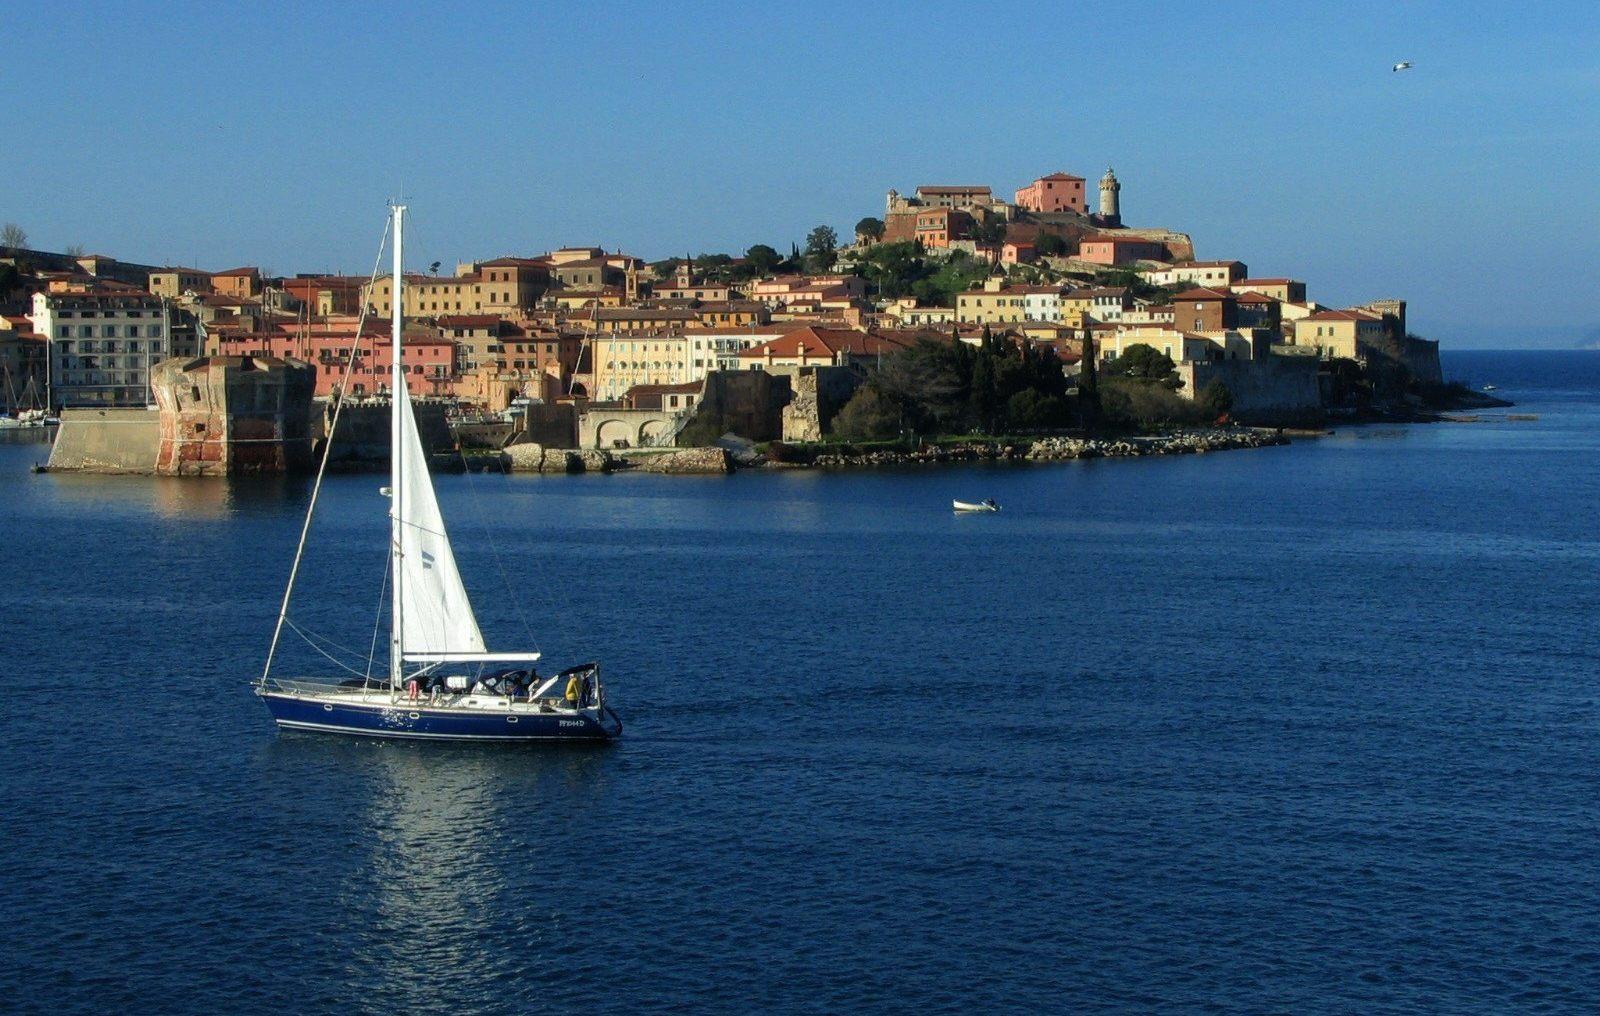 portoferraio centro storico veduta da mare